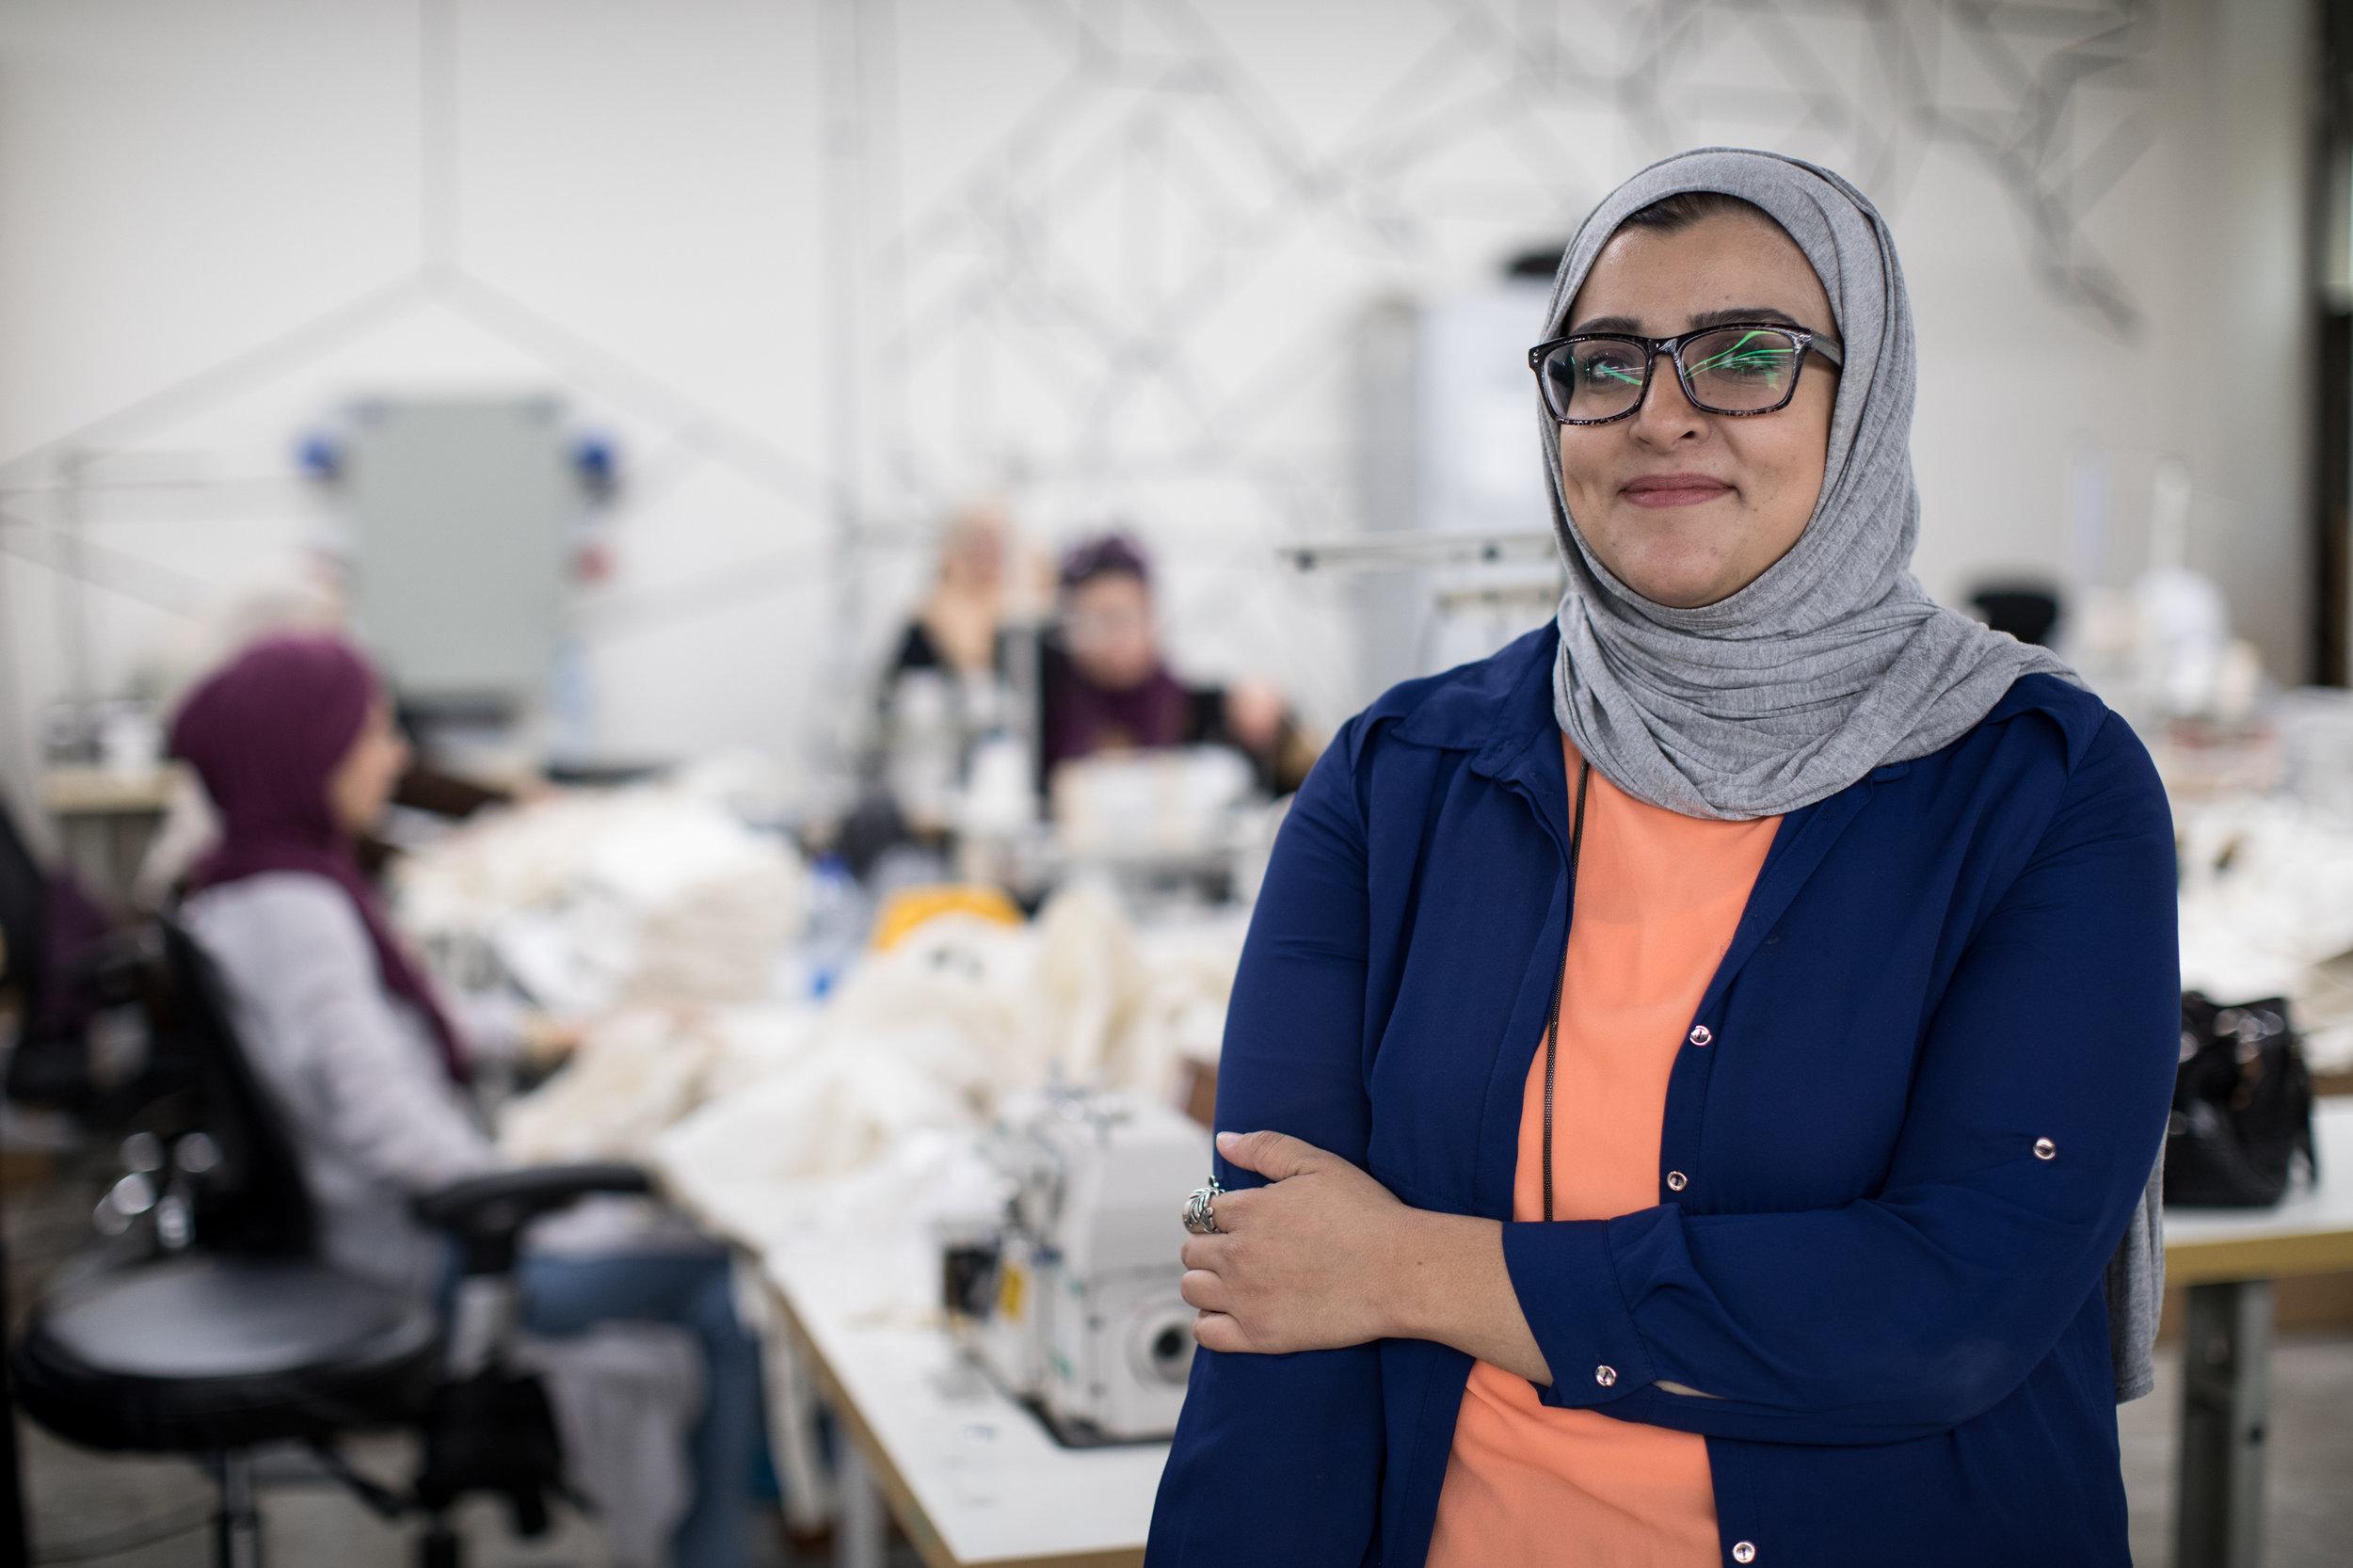 2018-06-23_Raneem Faisal, Teenah textile company, Irbid, JO_d1_0619.jpg